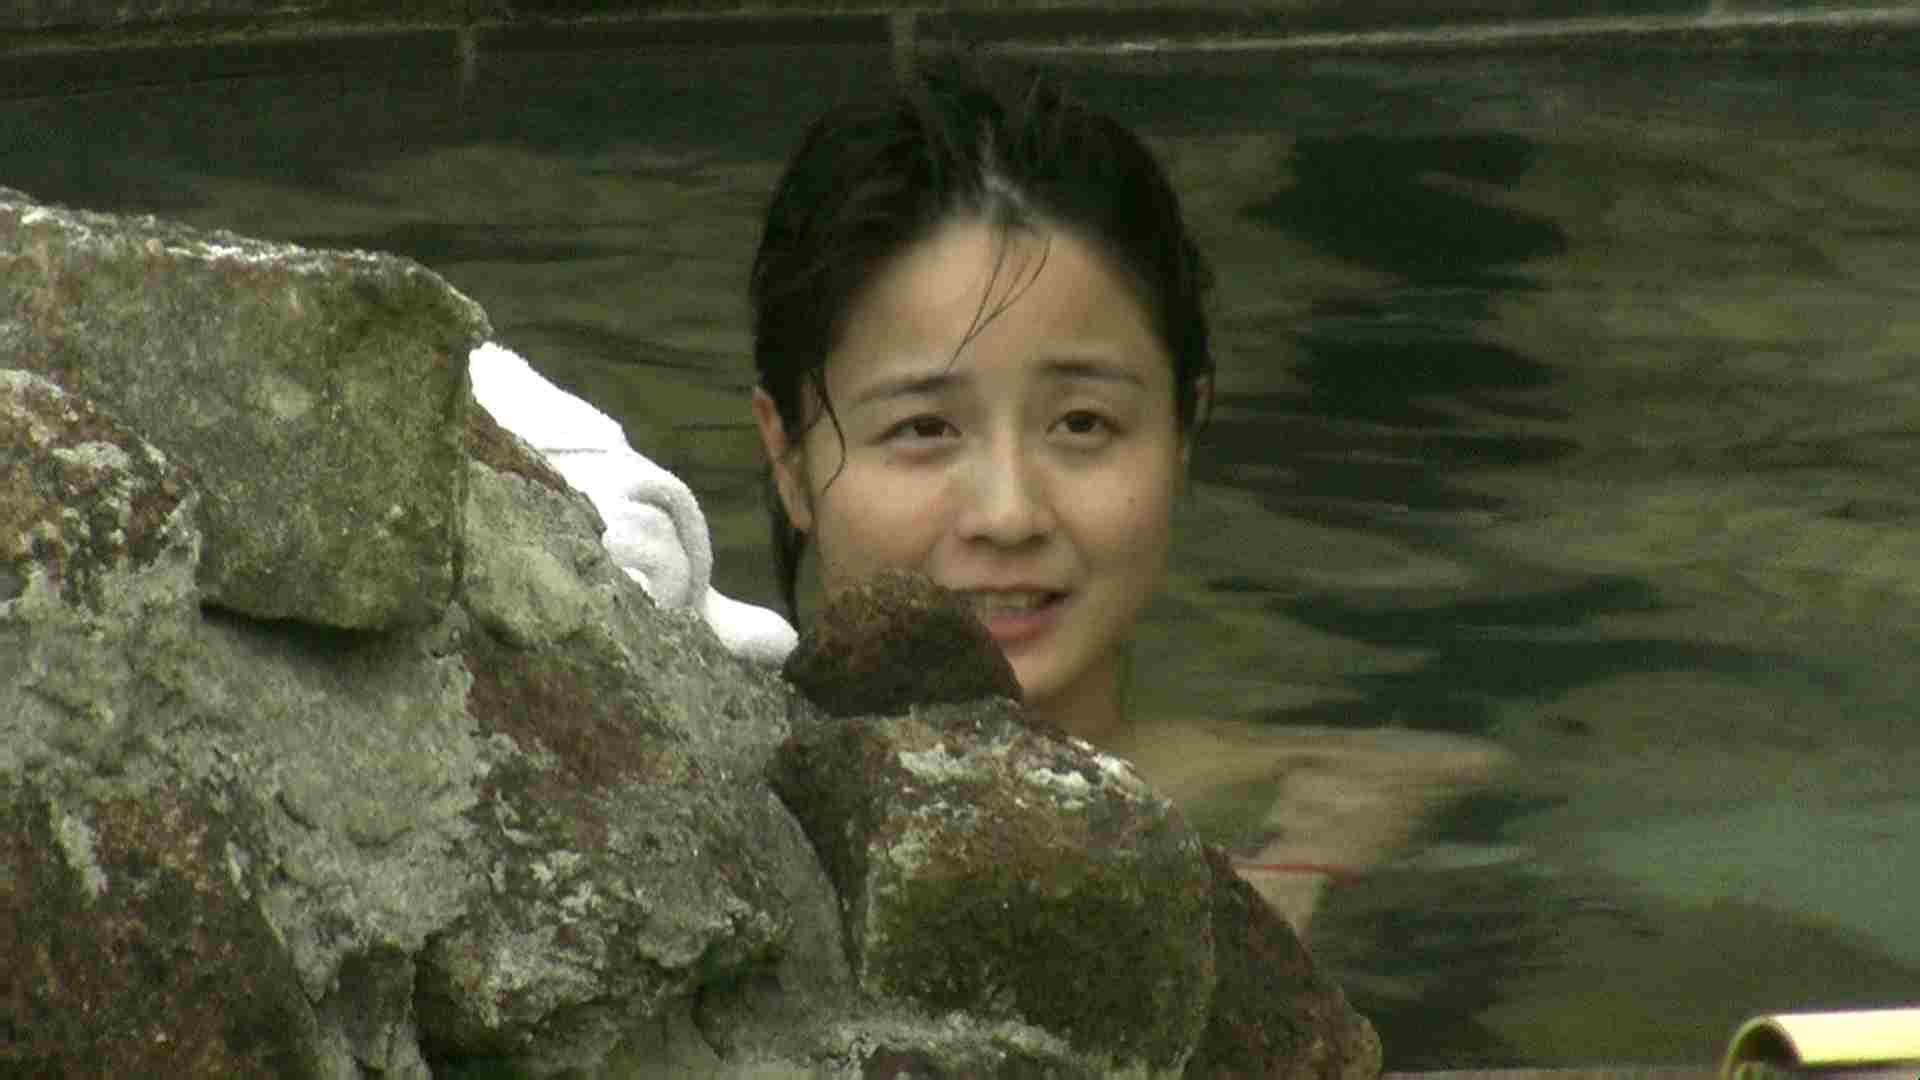 Aquaな露天風呂Vol.635 露天風呂編  77PIX 4